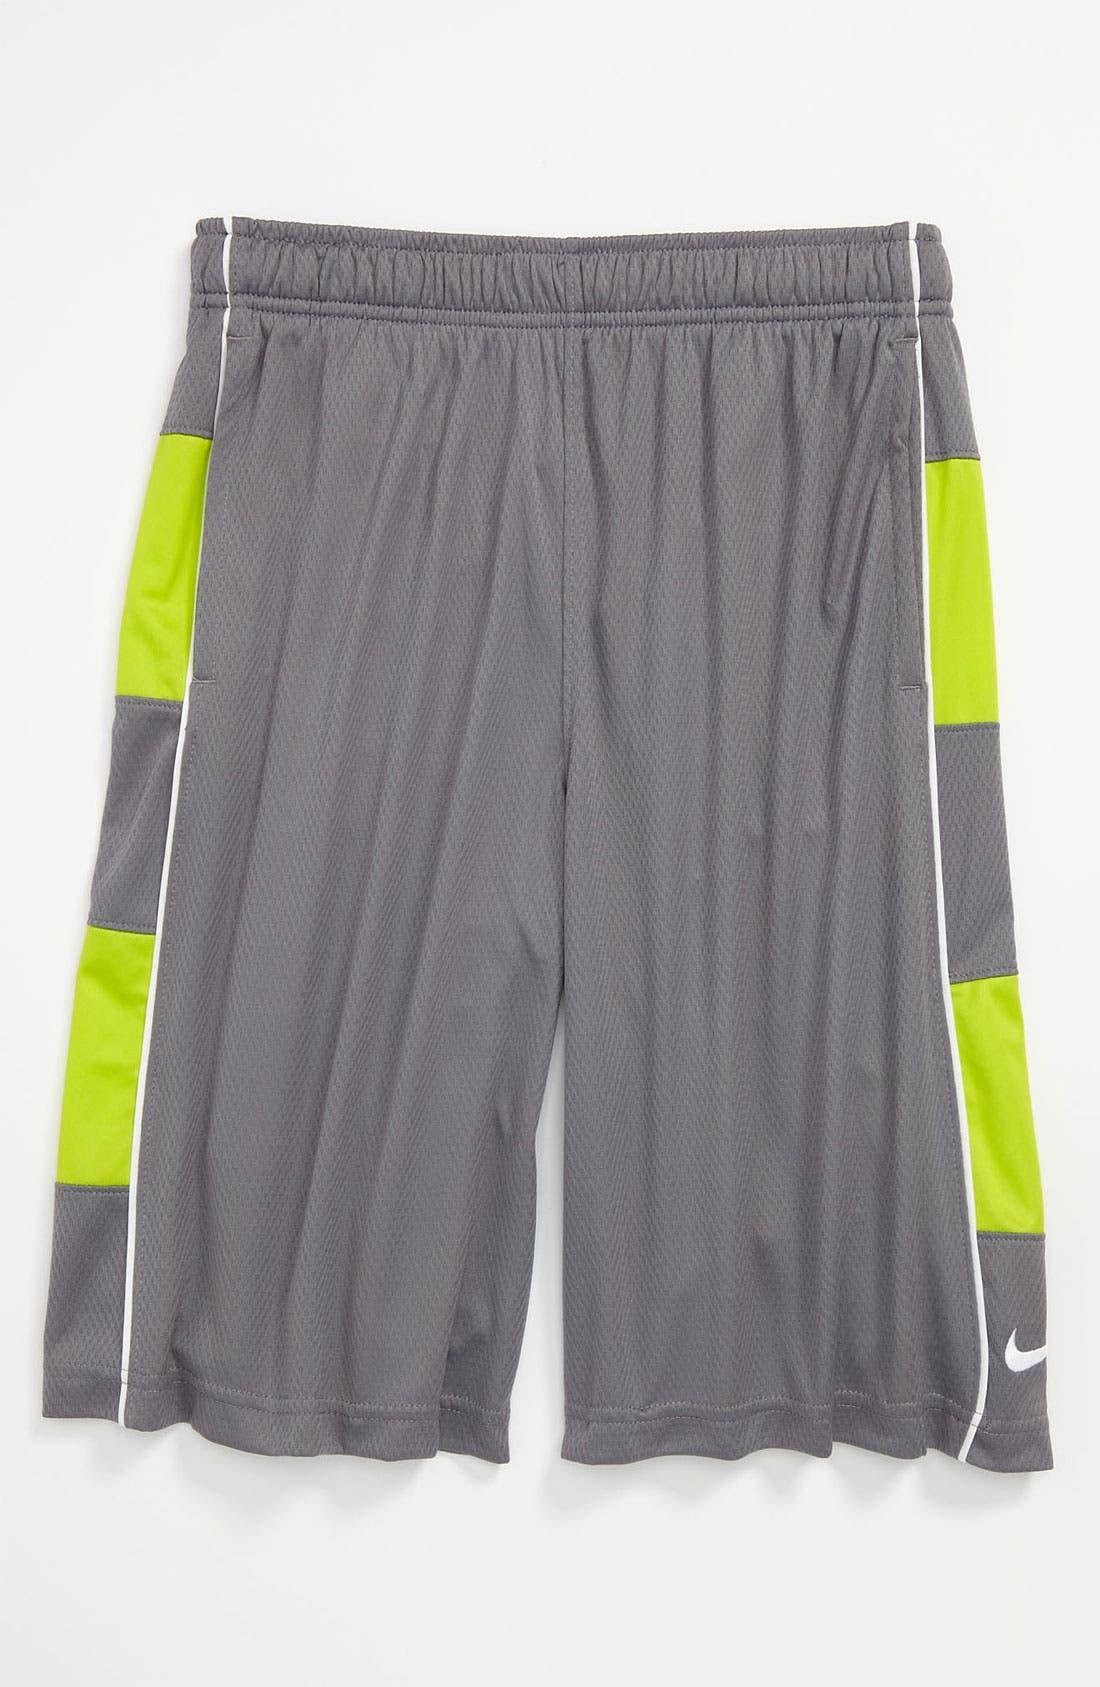 Main Image - Nike 'Rivalry' Dri-FIT Shorts (Big Boys)